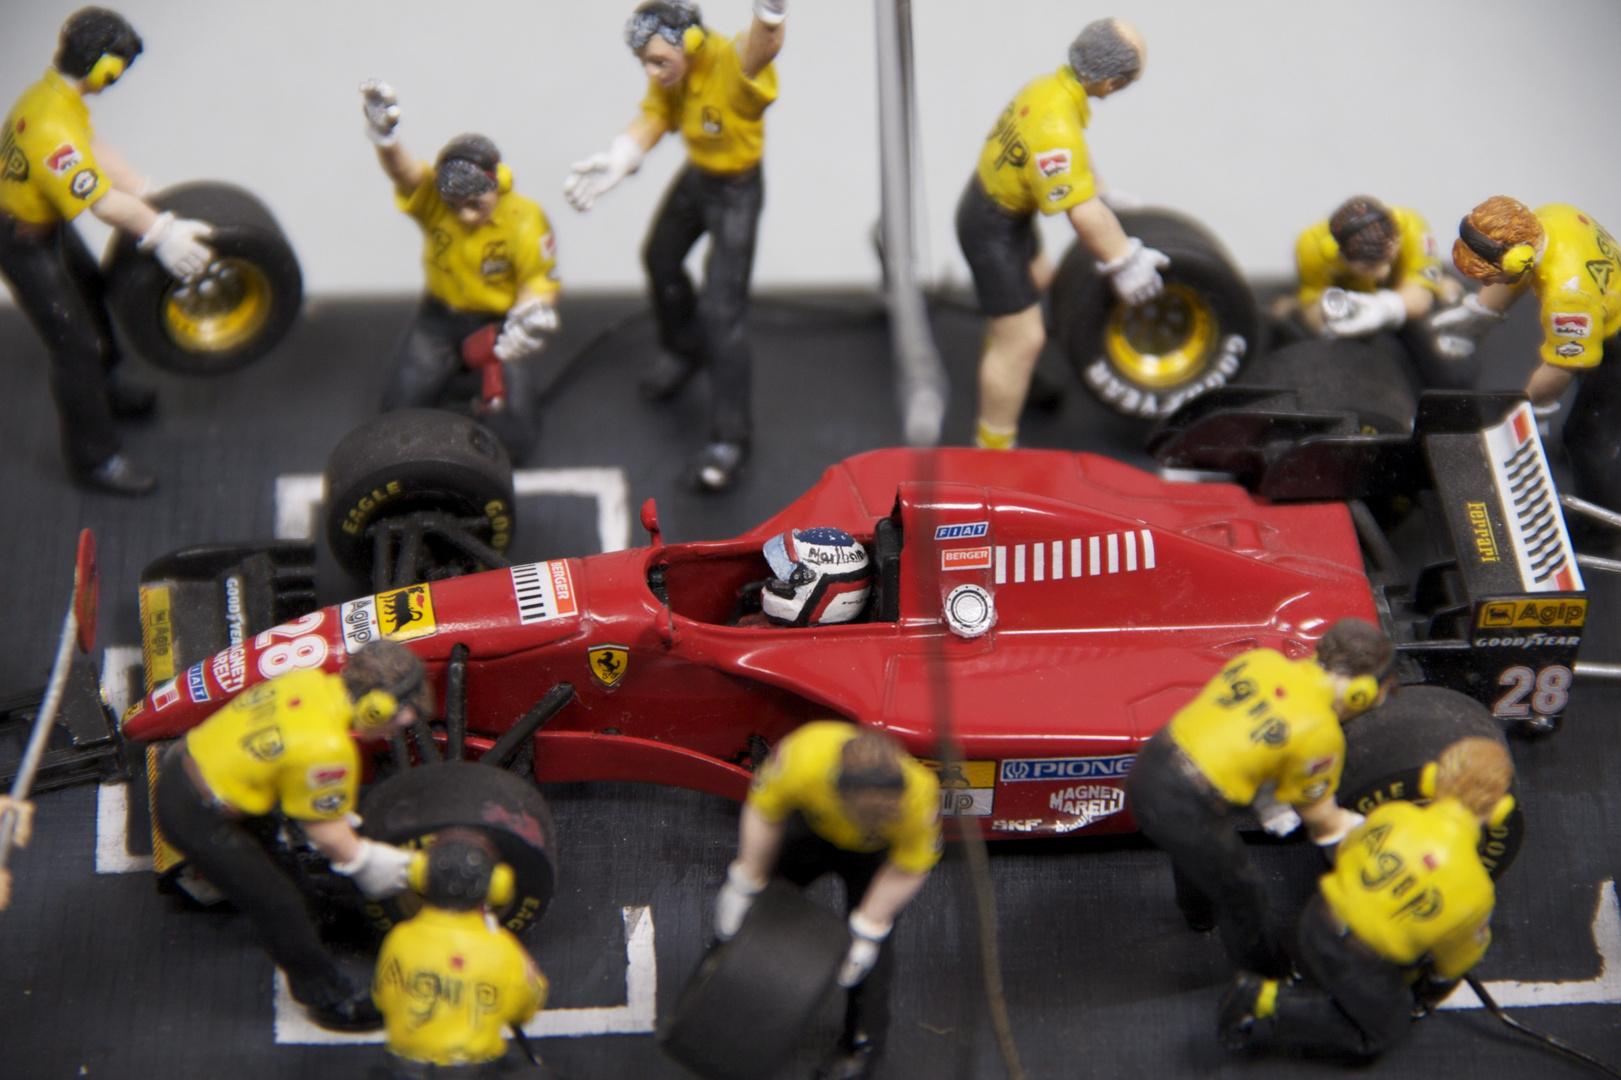 Ferrari beim Boxenstopp - 2. Versuch